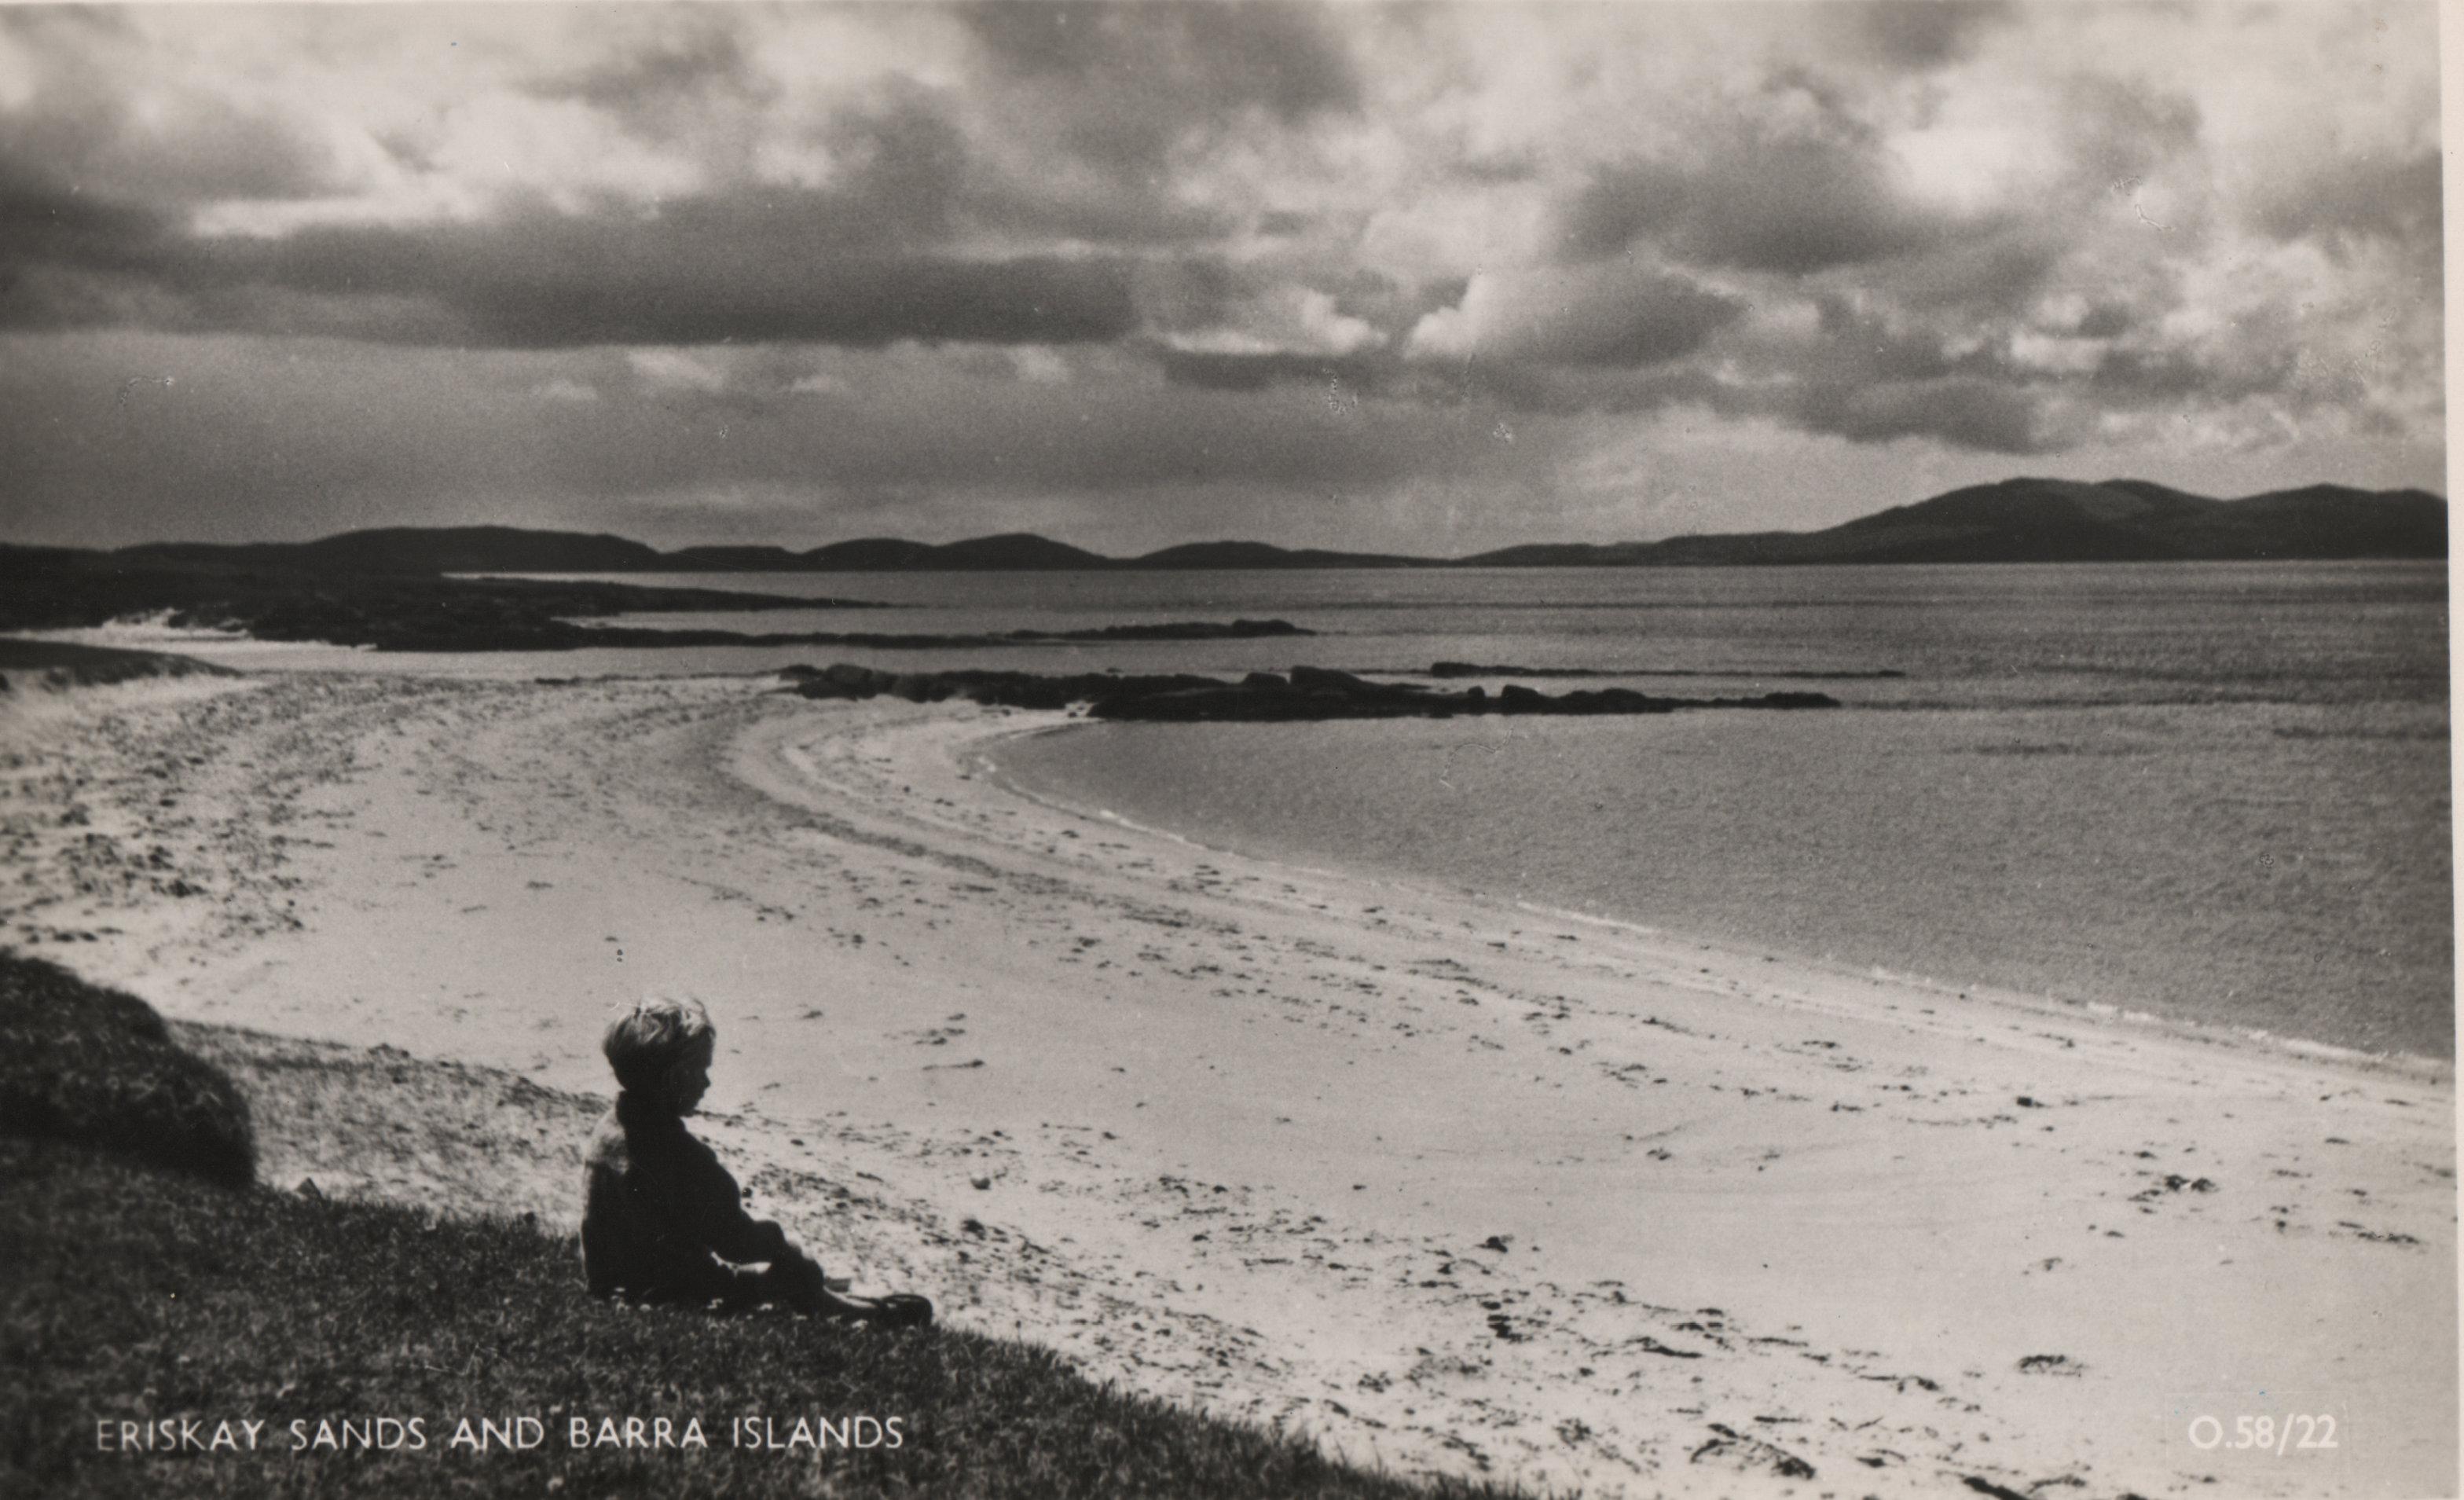 Eriskay sands and Barra Islands